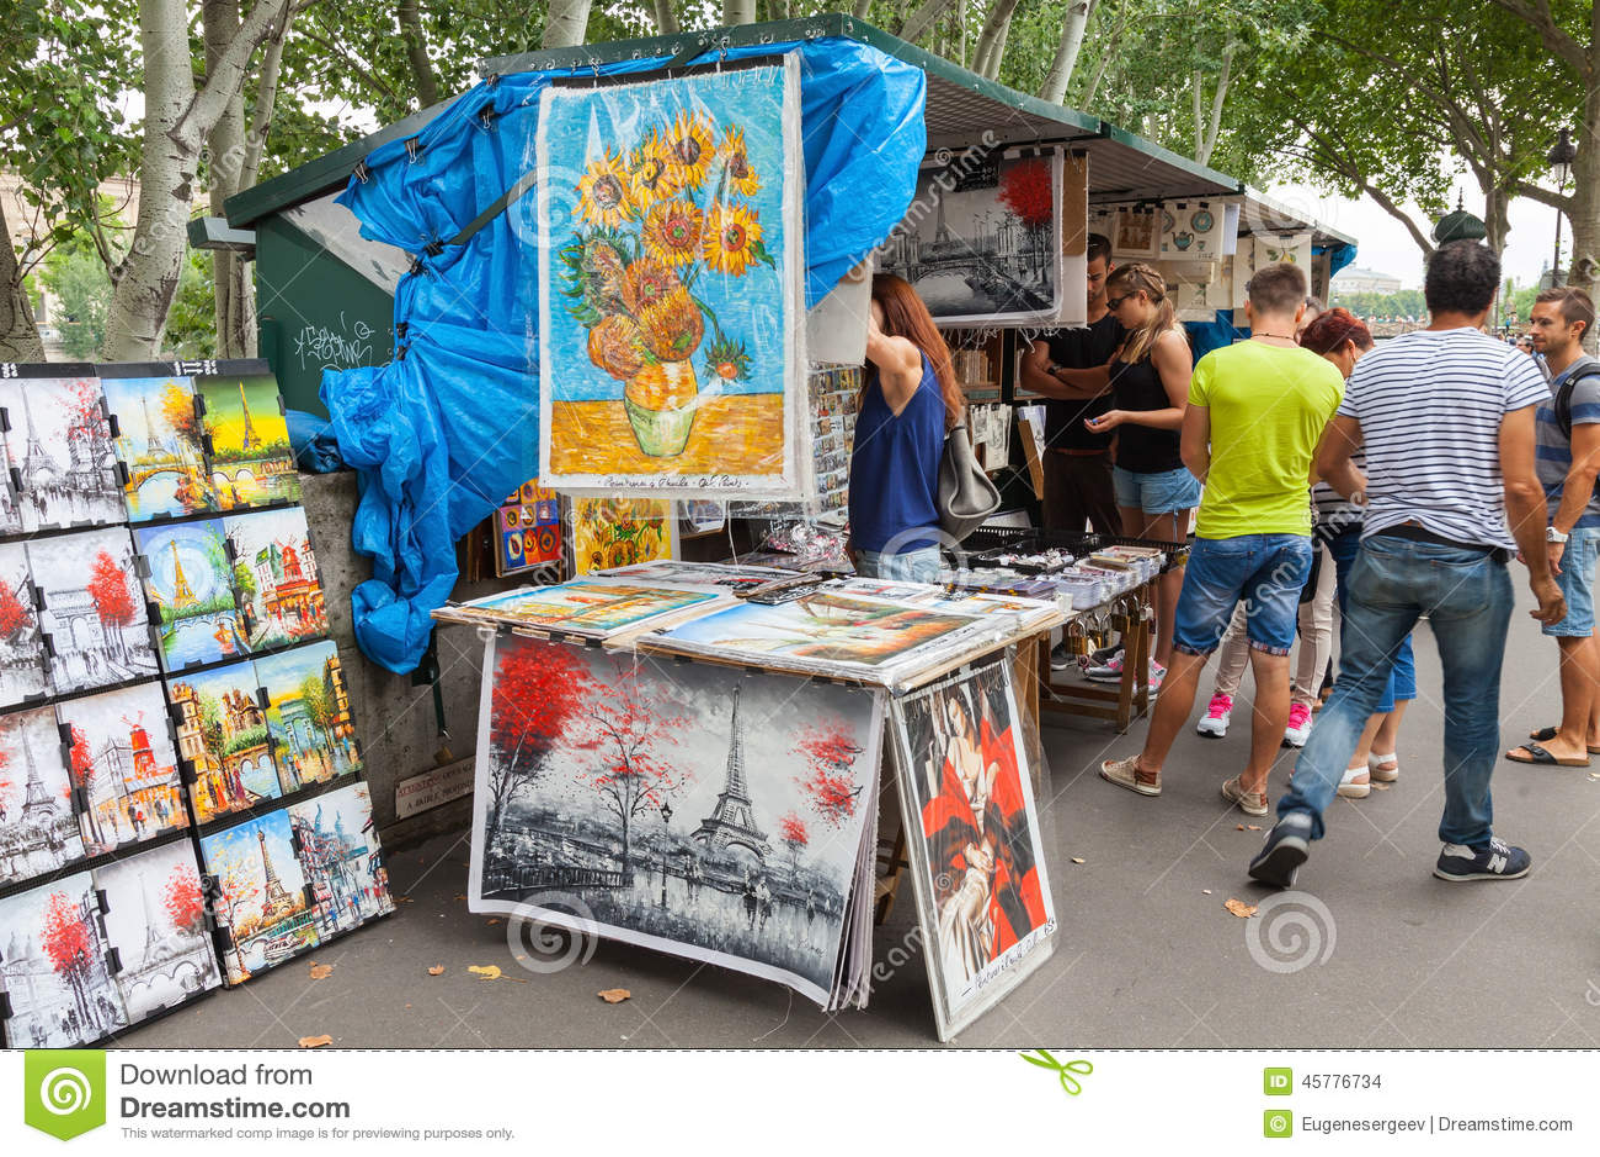 Small Art And Souvenir Shop In Paris, France Editorial Stock